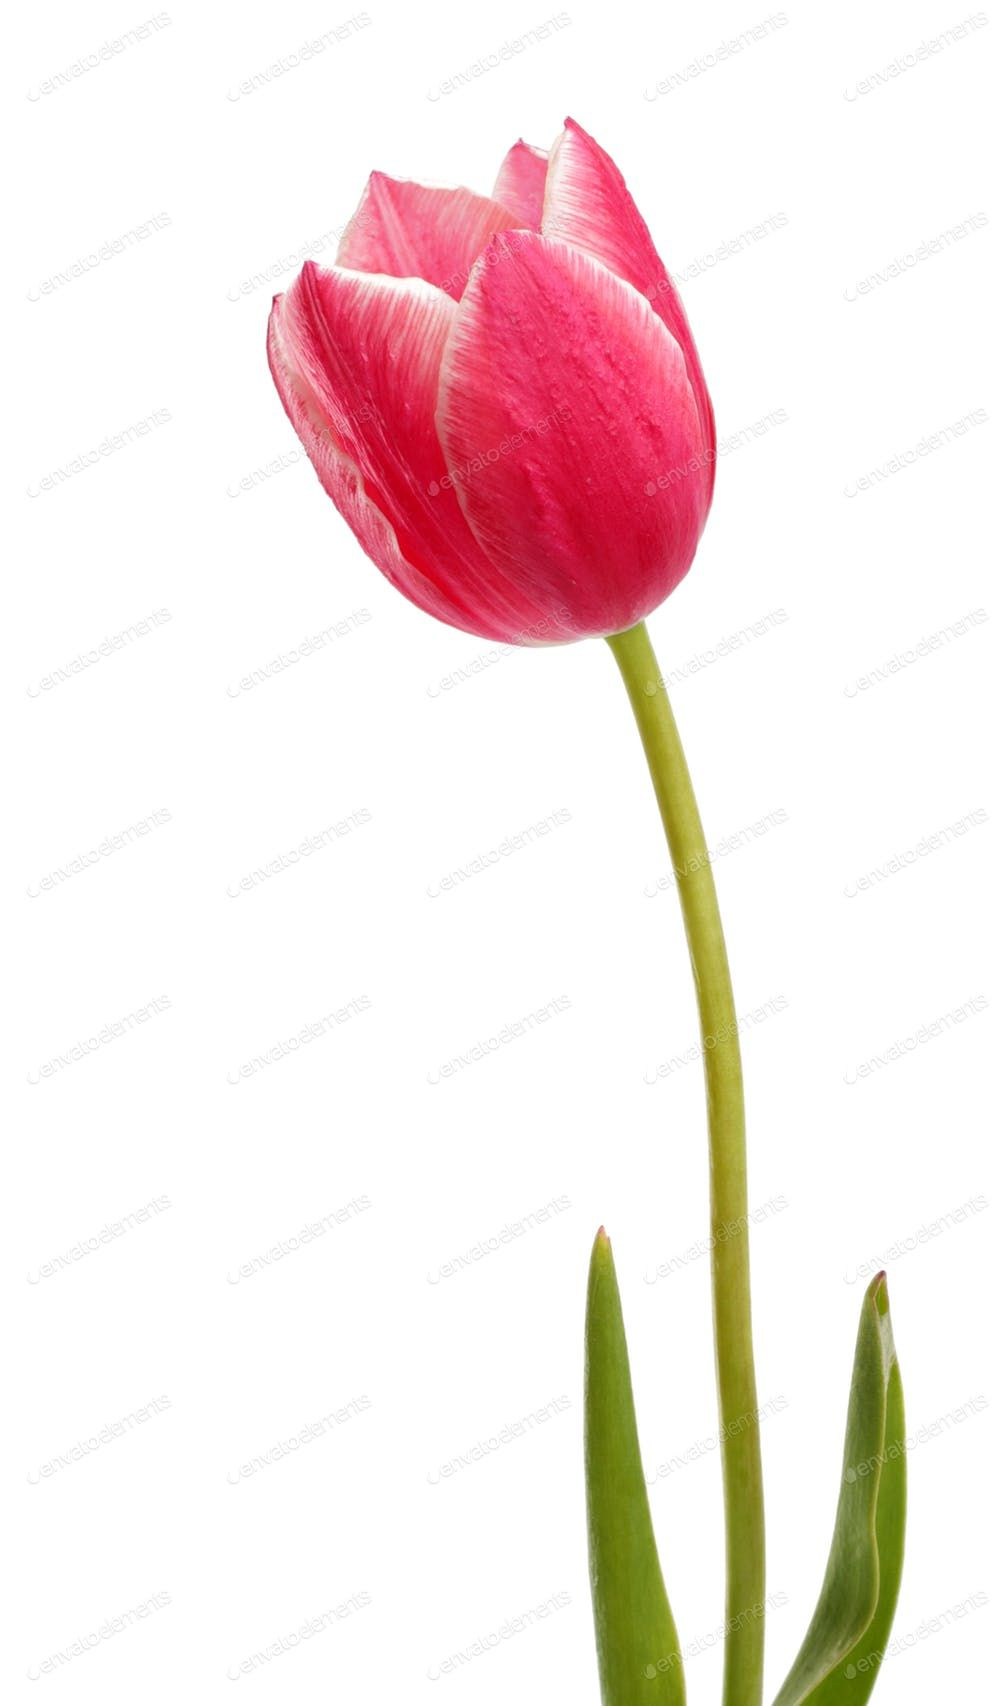 Pink Tulip Flower By Michalex S Photos Ad Ad Pink Tulip